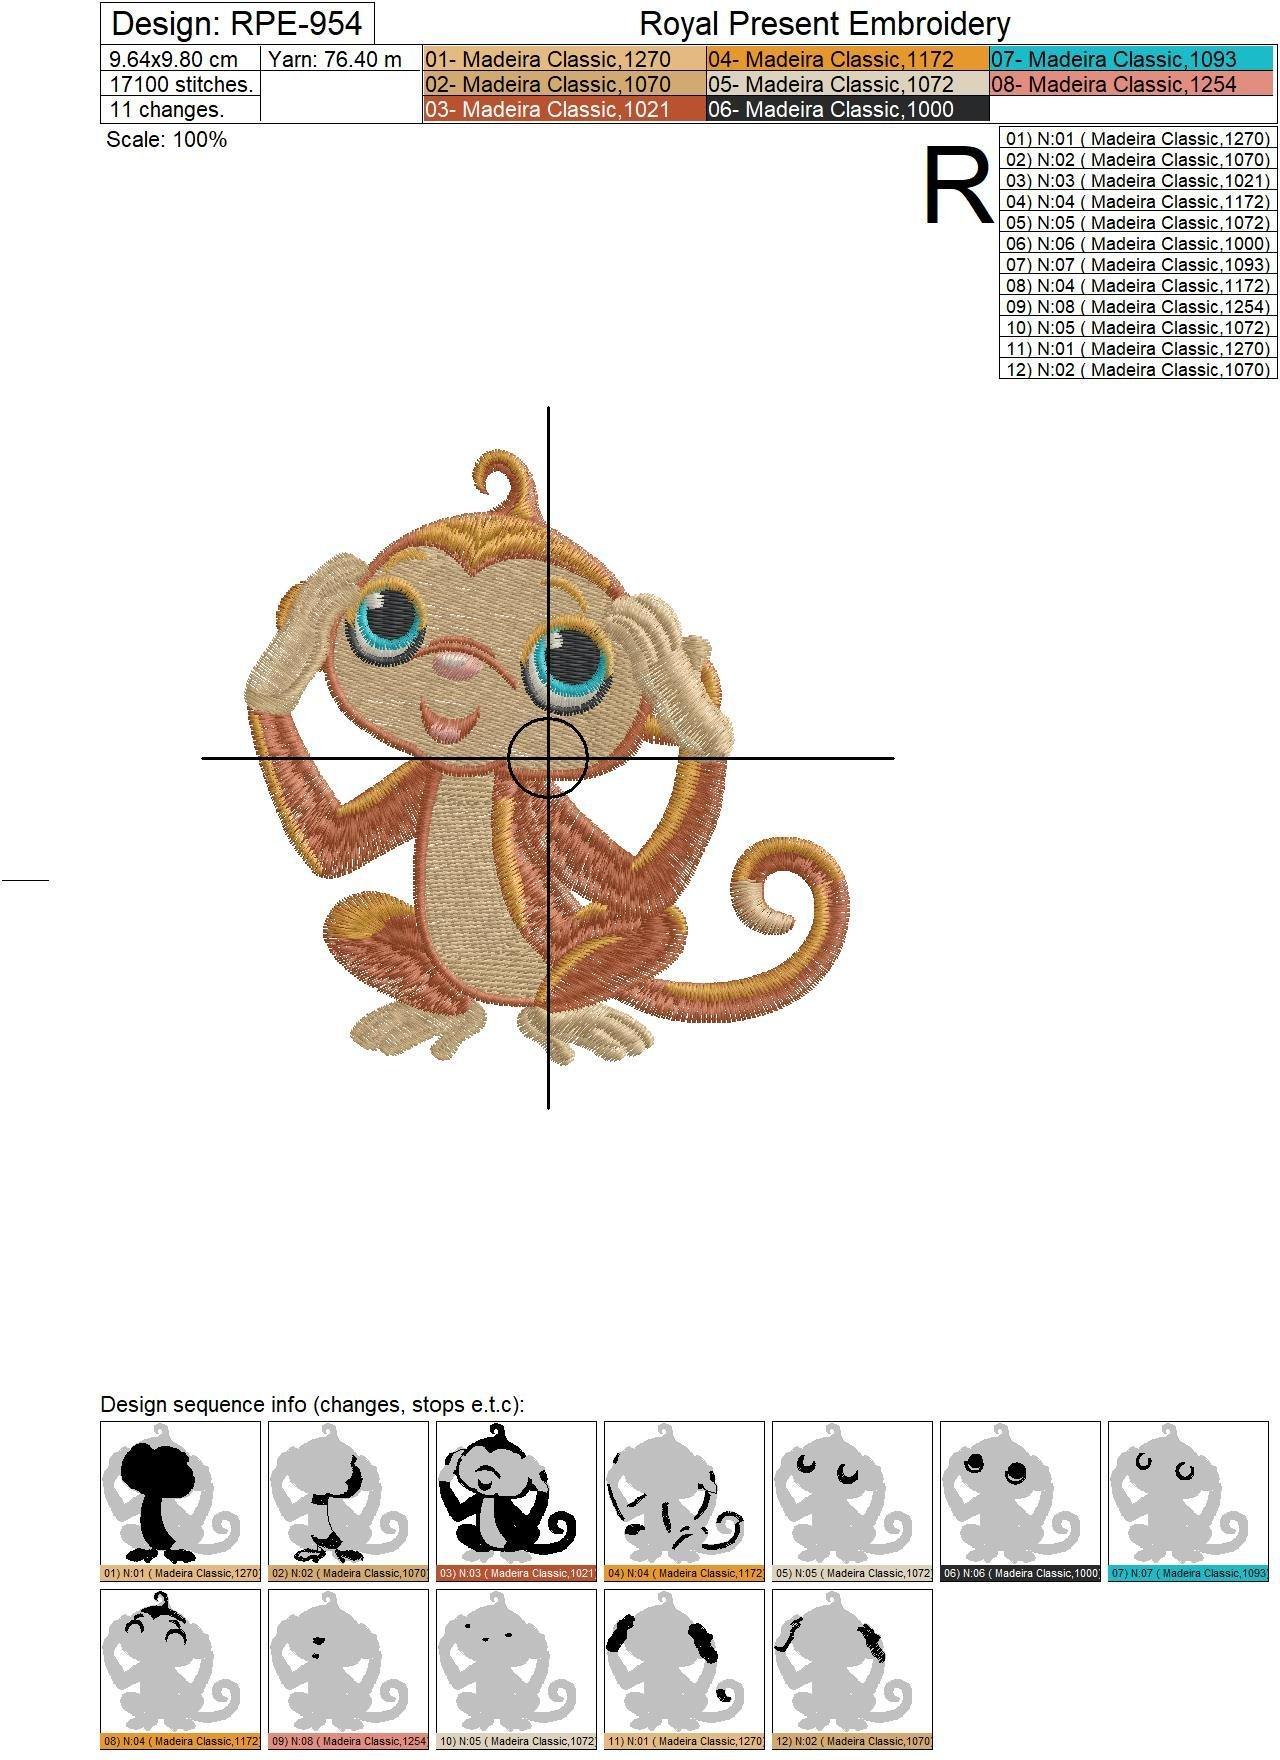 Machine Embroidery Design Three Cute Monkeys - 2 sizes